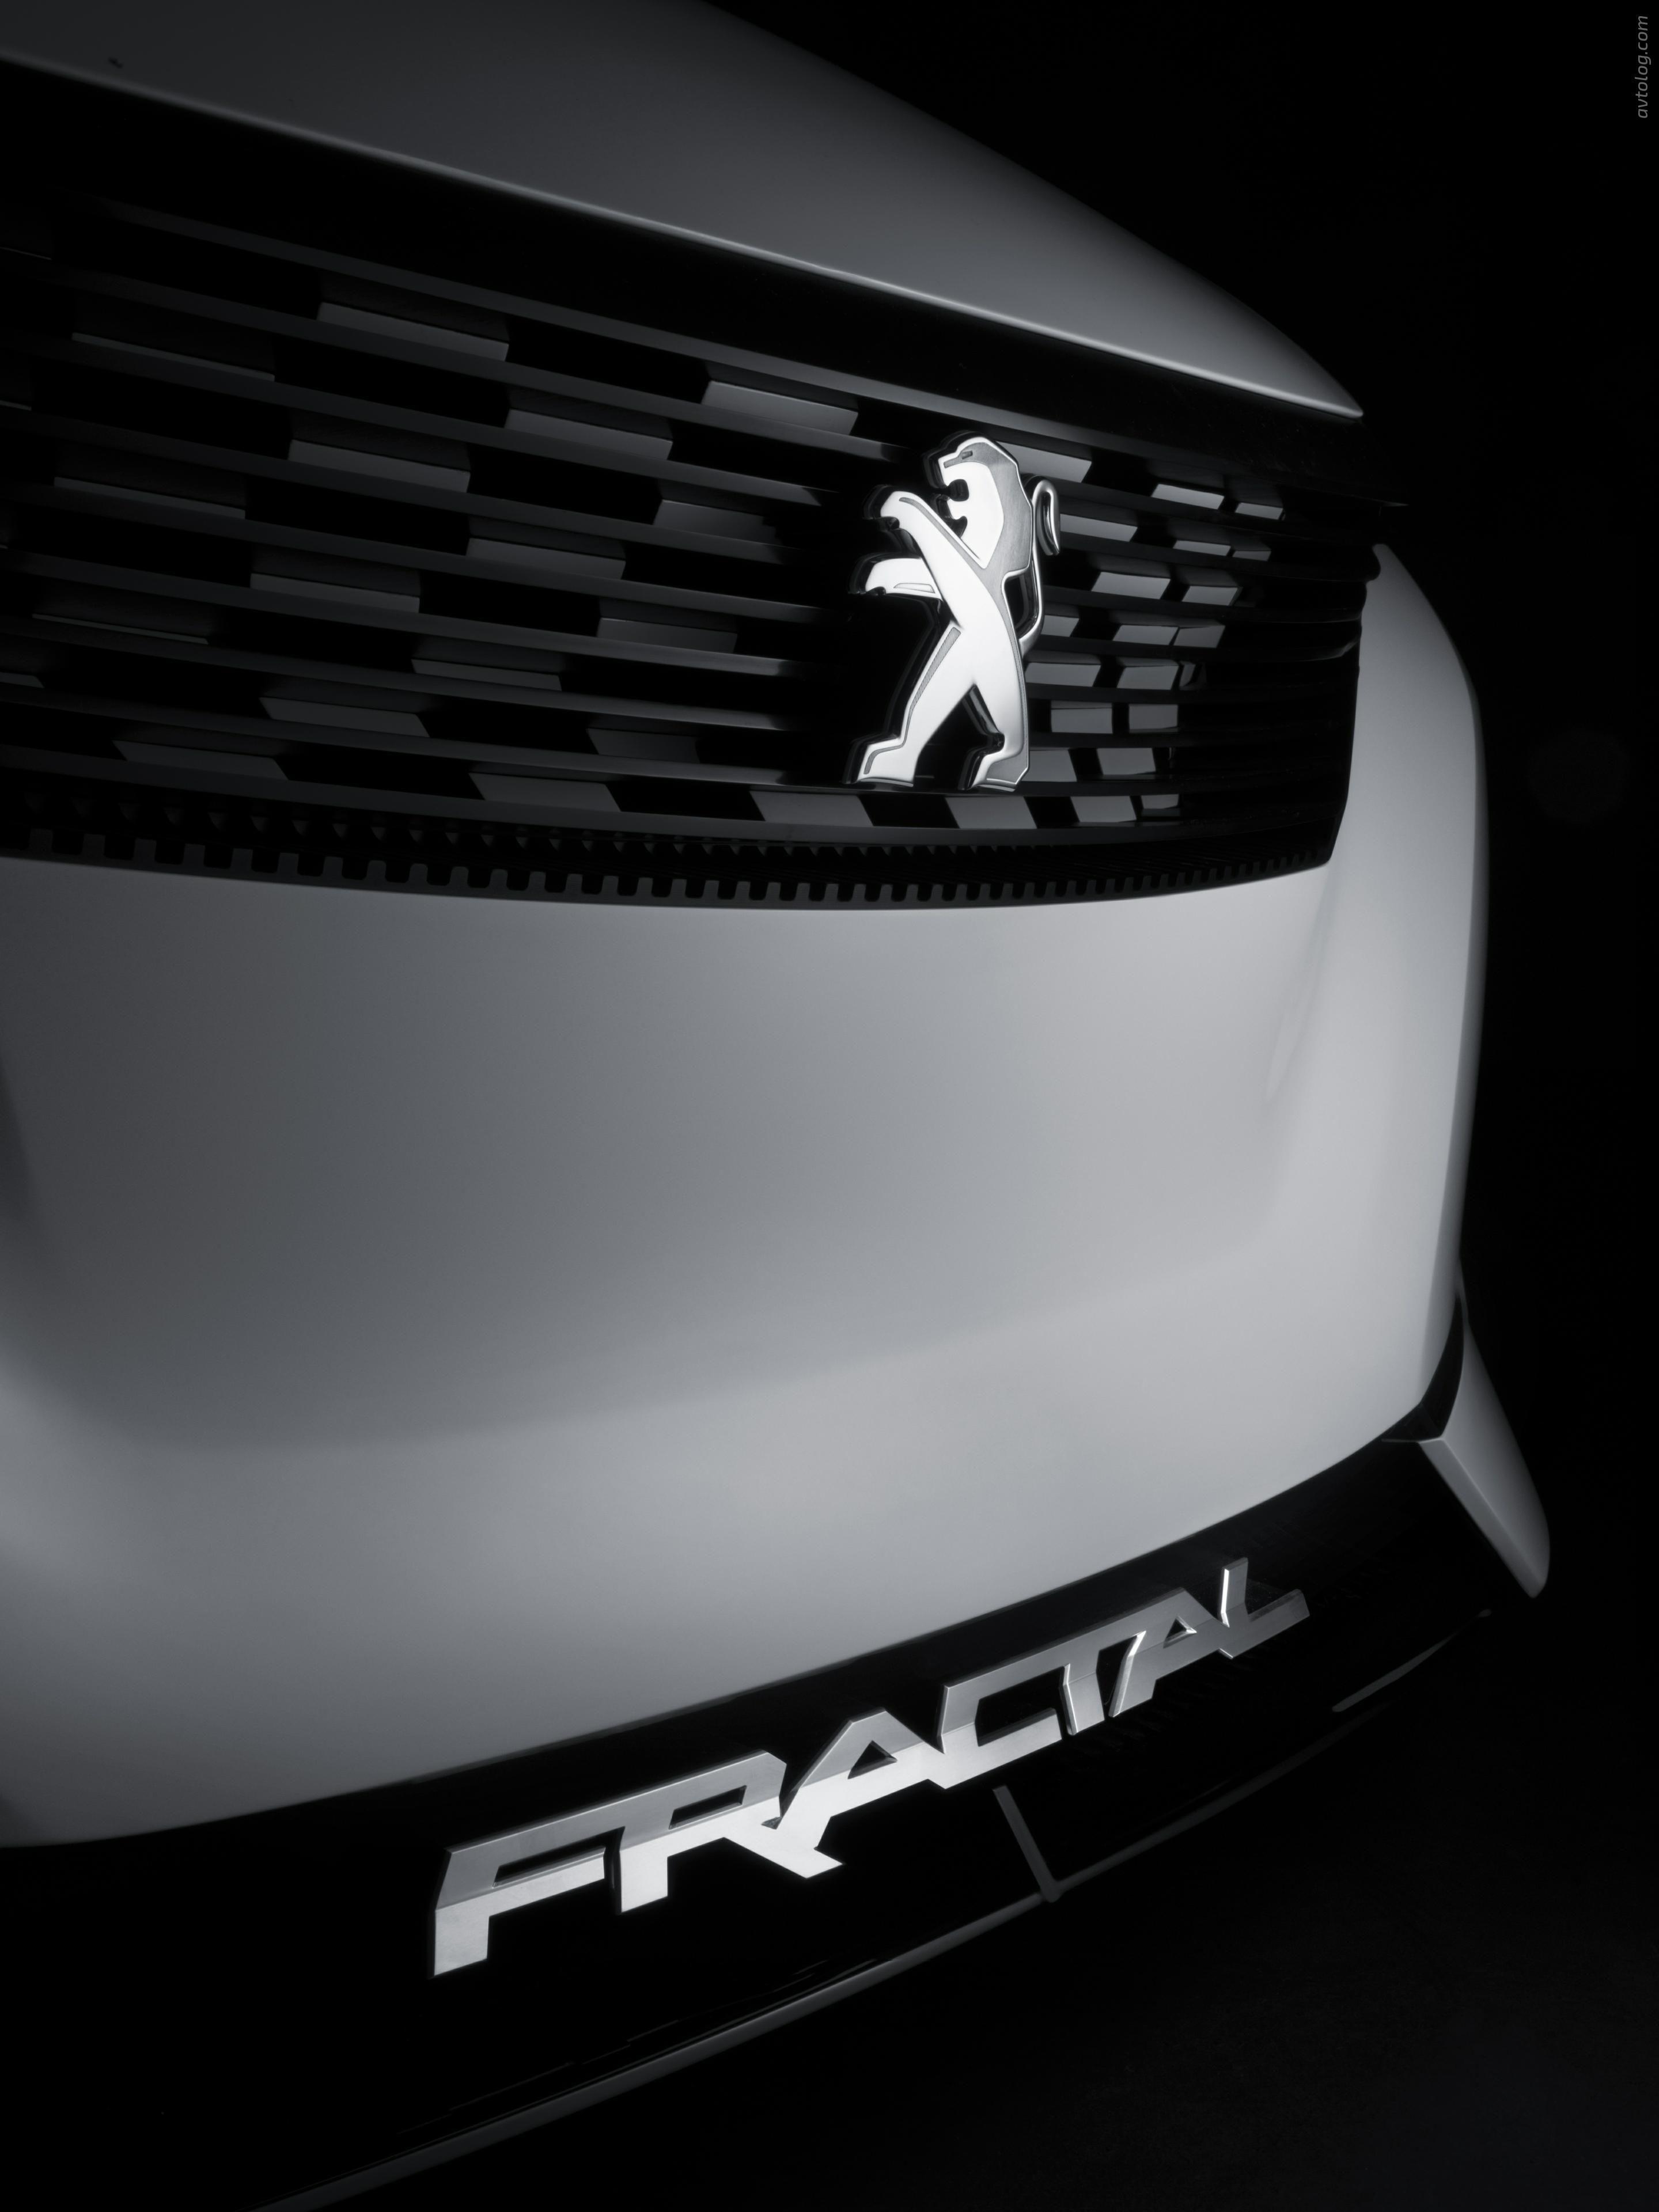 2015 Peugeot Fractal Concept  #Peugeot #Peugeot_Fractal #2015 #Concept #French_brands #Segment_B #2015MY